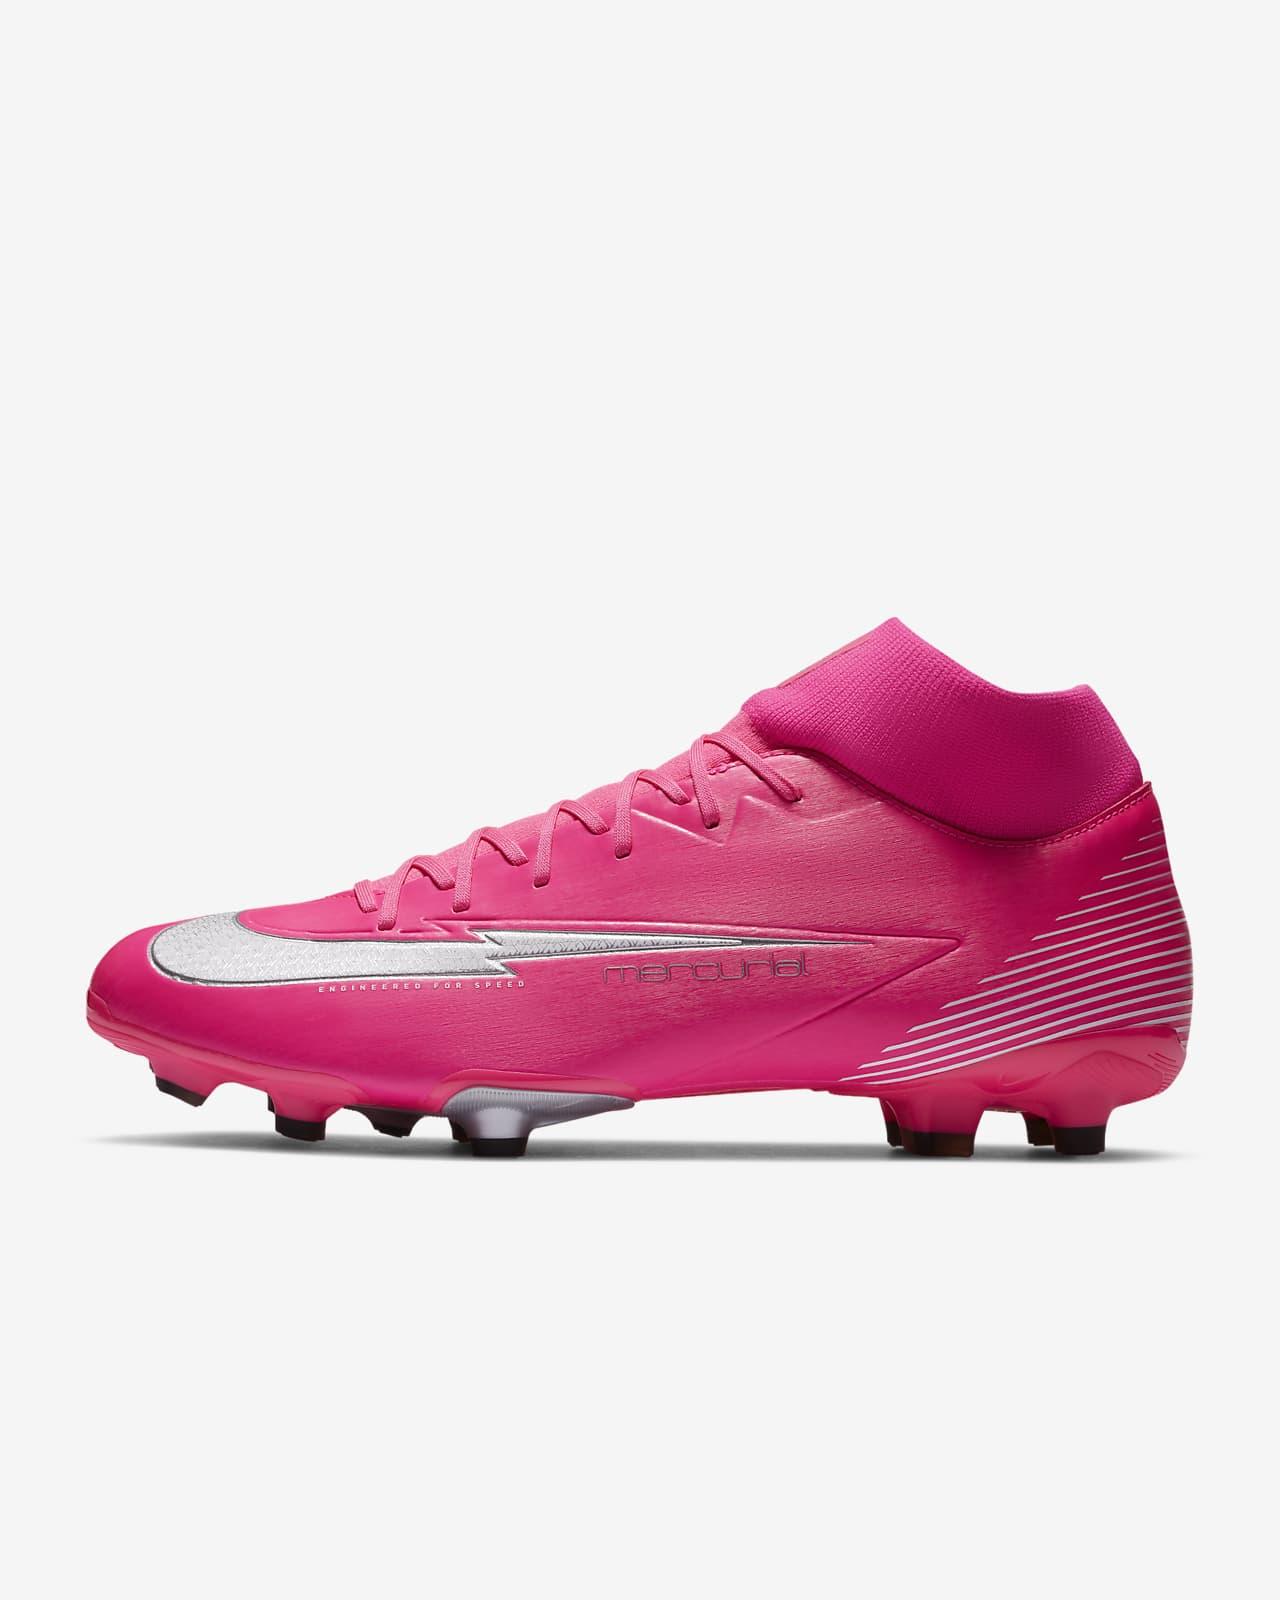 Nike Mercurial Superfly 7 Academy Mbappé Rosa MG Fußballschuh für verschiedene Böden